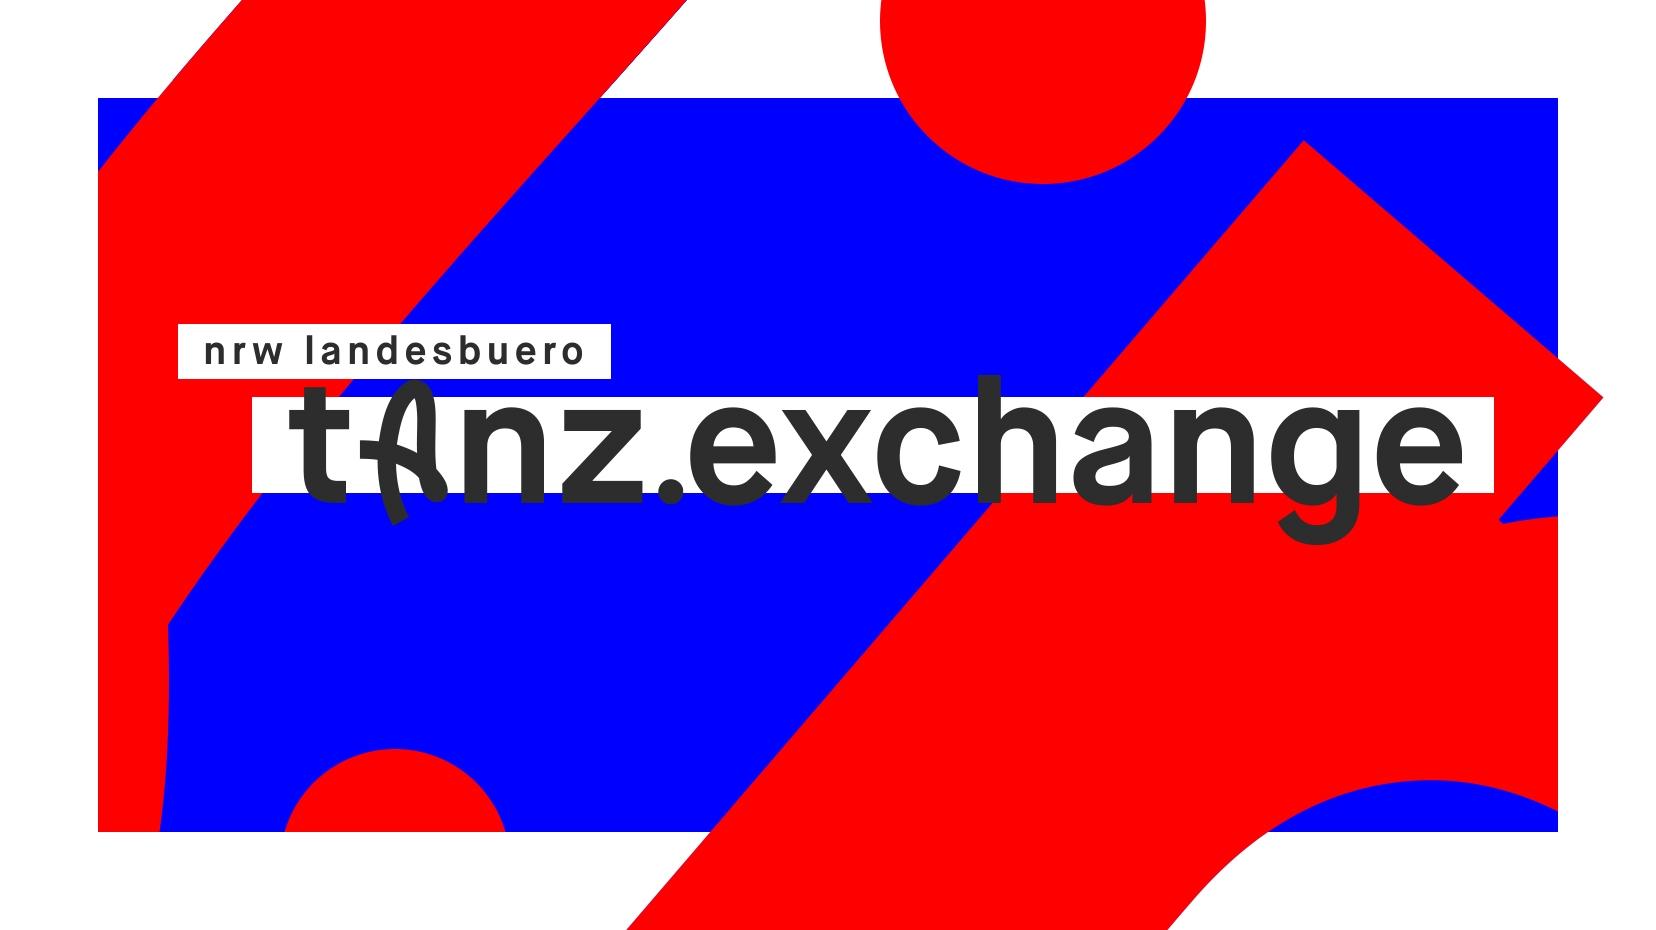 tanz.exchange